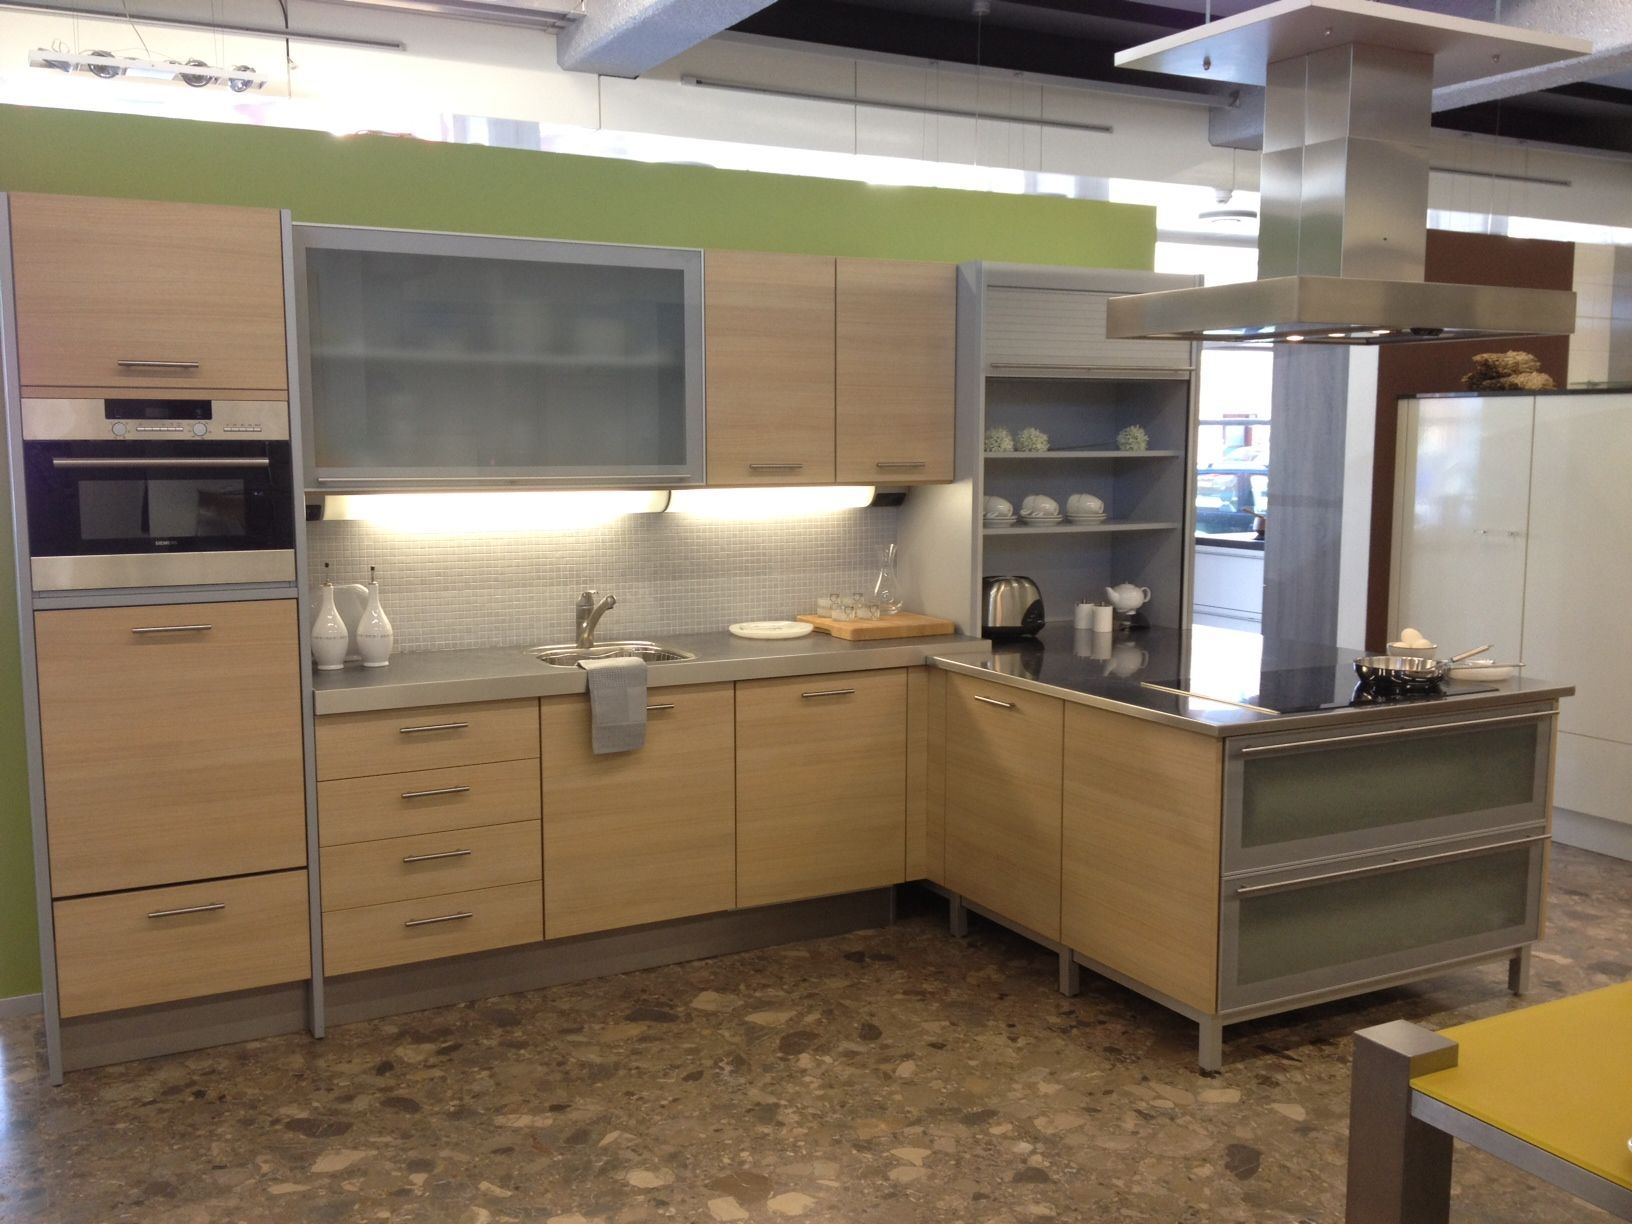 Keuken Plint Rvs : keukensite van Nederland Licht eiken/titaan hoek keuken [45352